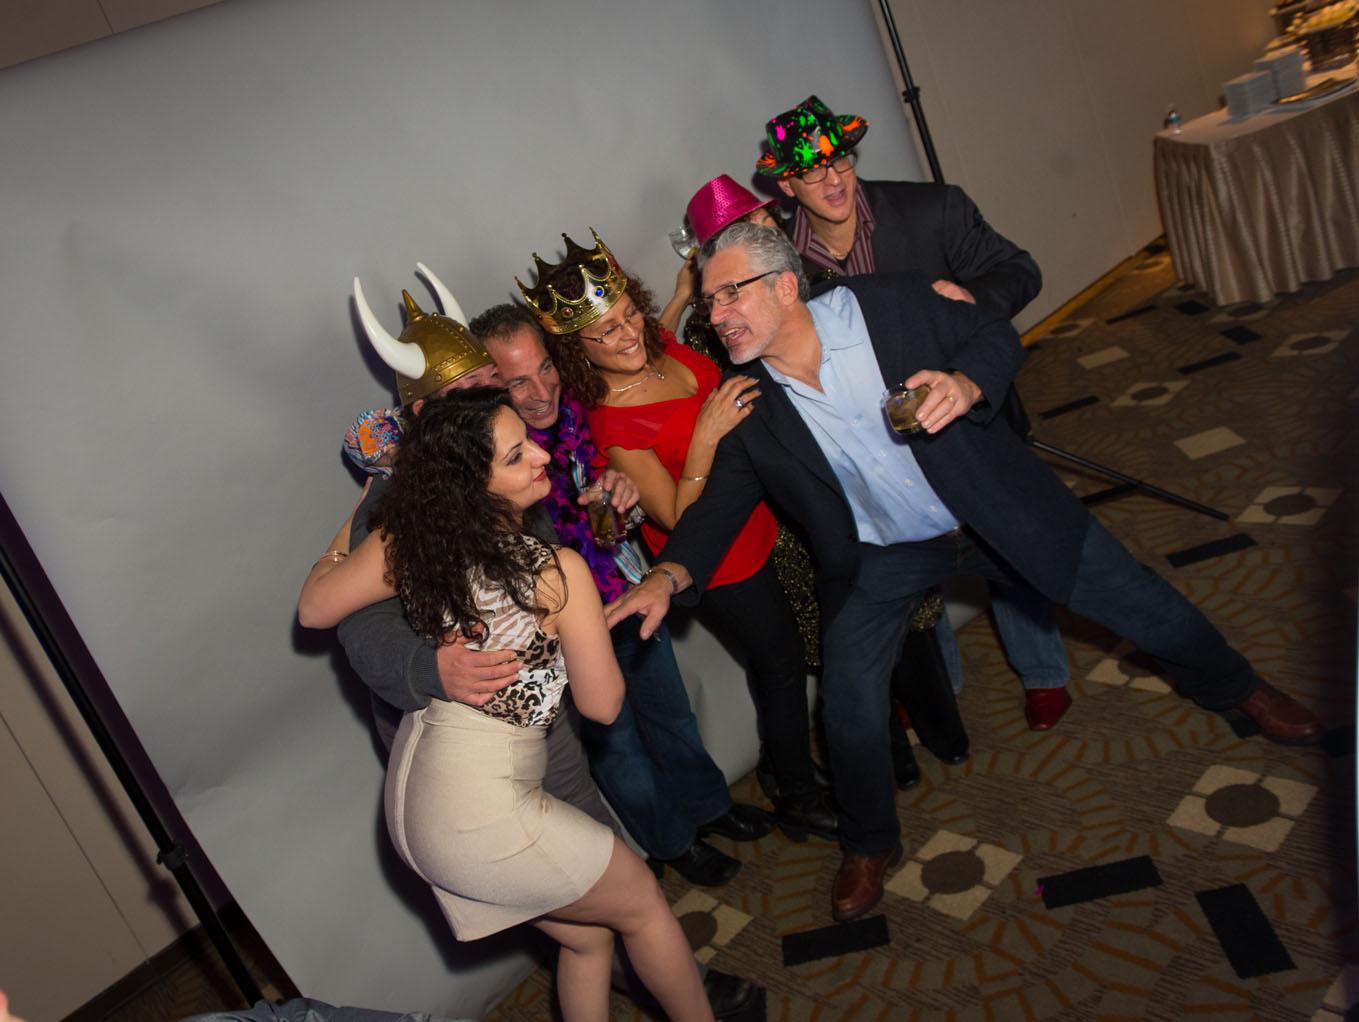 2015-12-09 ReMax Corpoarte Event - The Borgata - Atlantic City NJ - Photo Sesh - 2015-5344.jpg